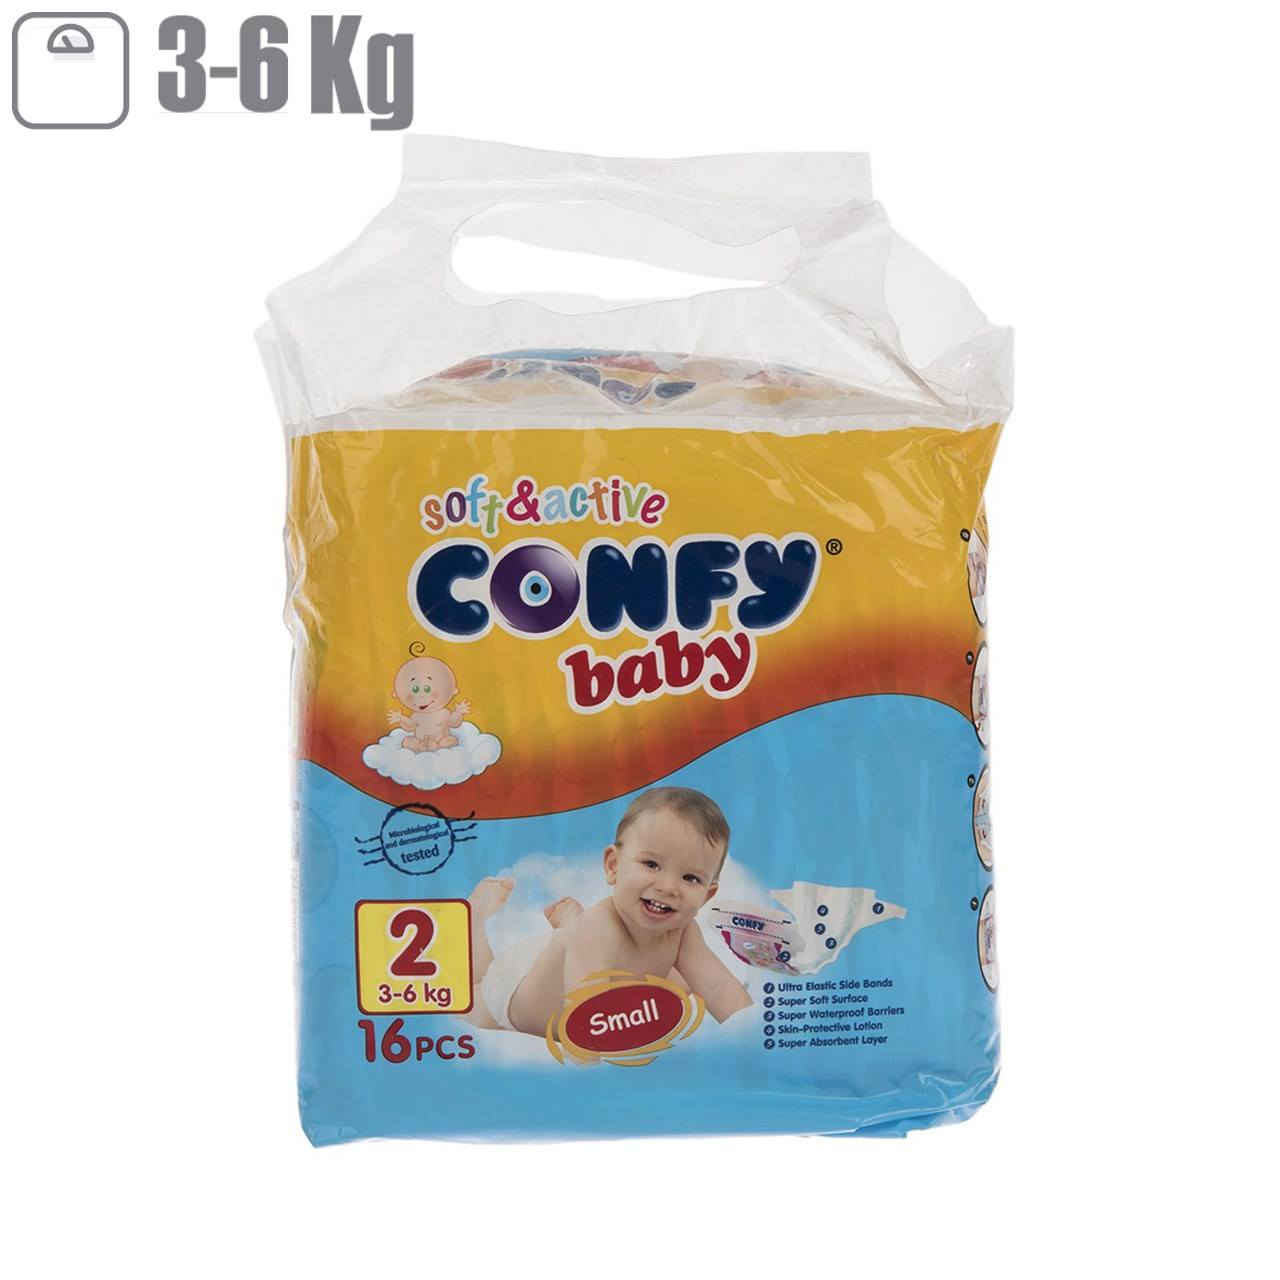 پوشک کودک کانفی سایز 2 بسته 16 عددی main 1 1